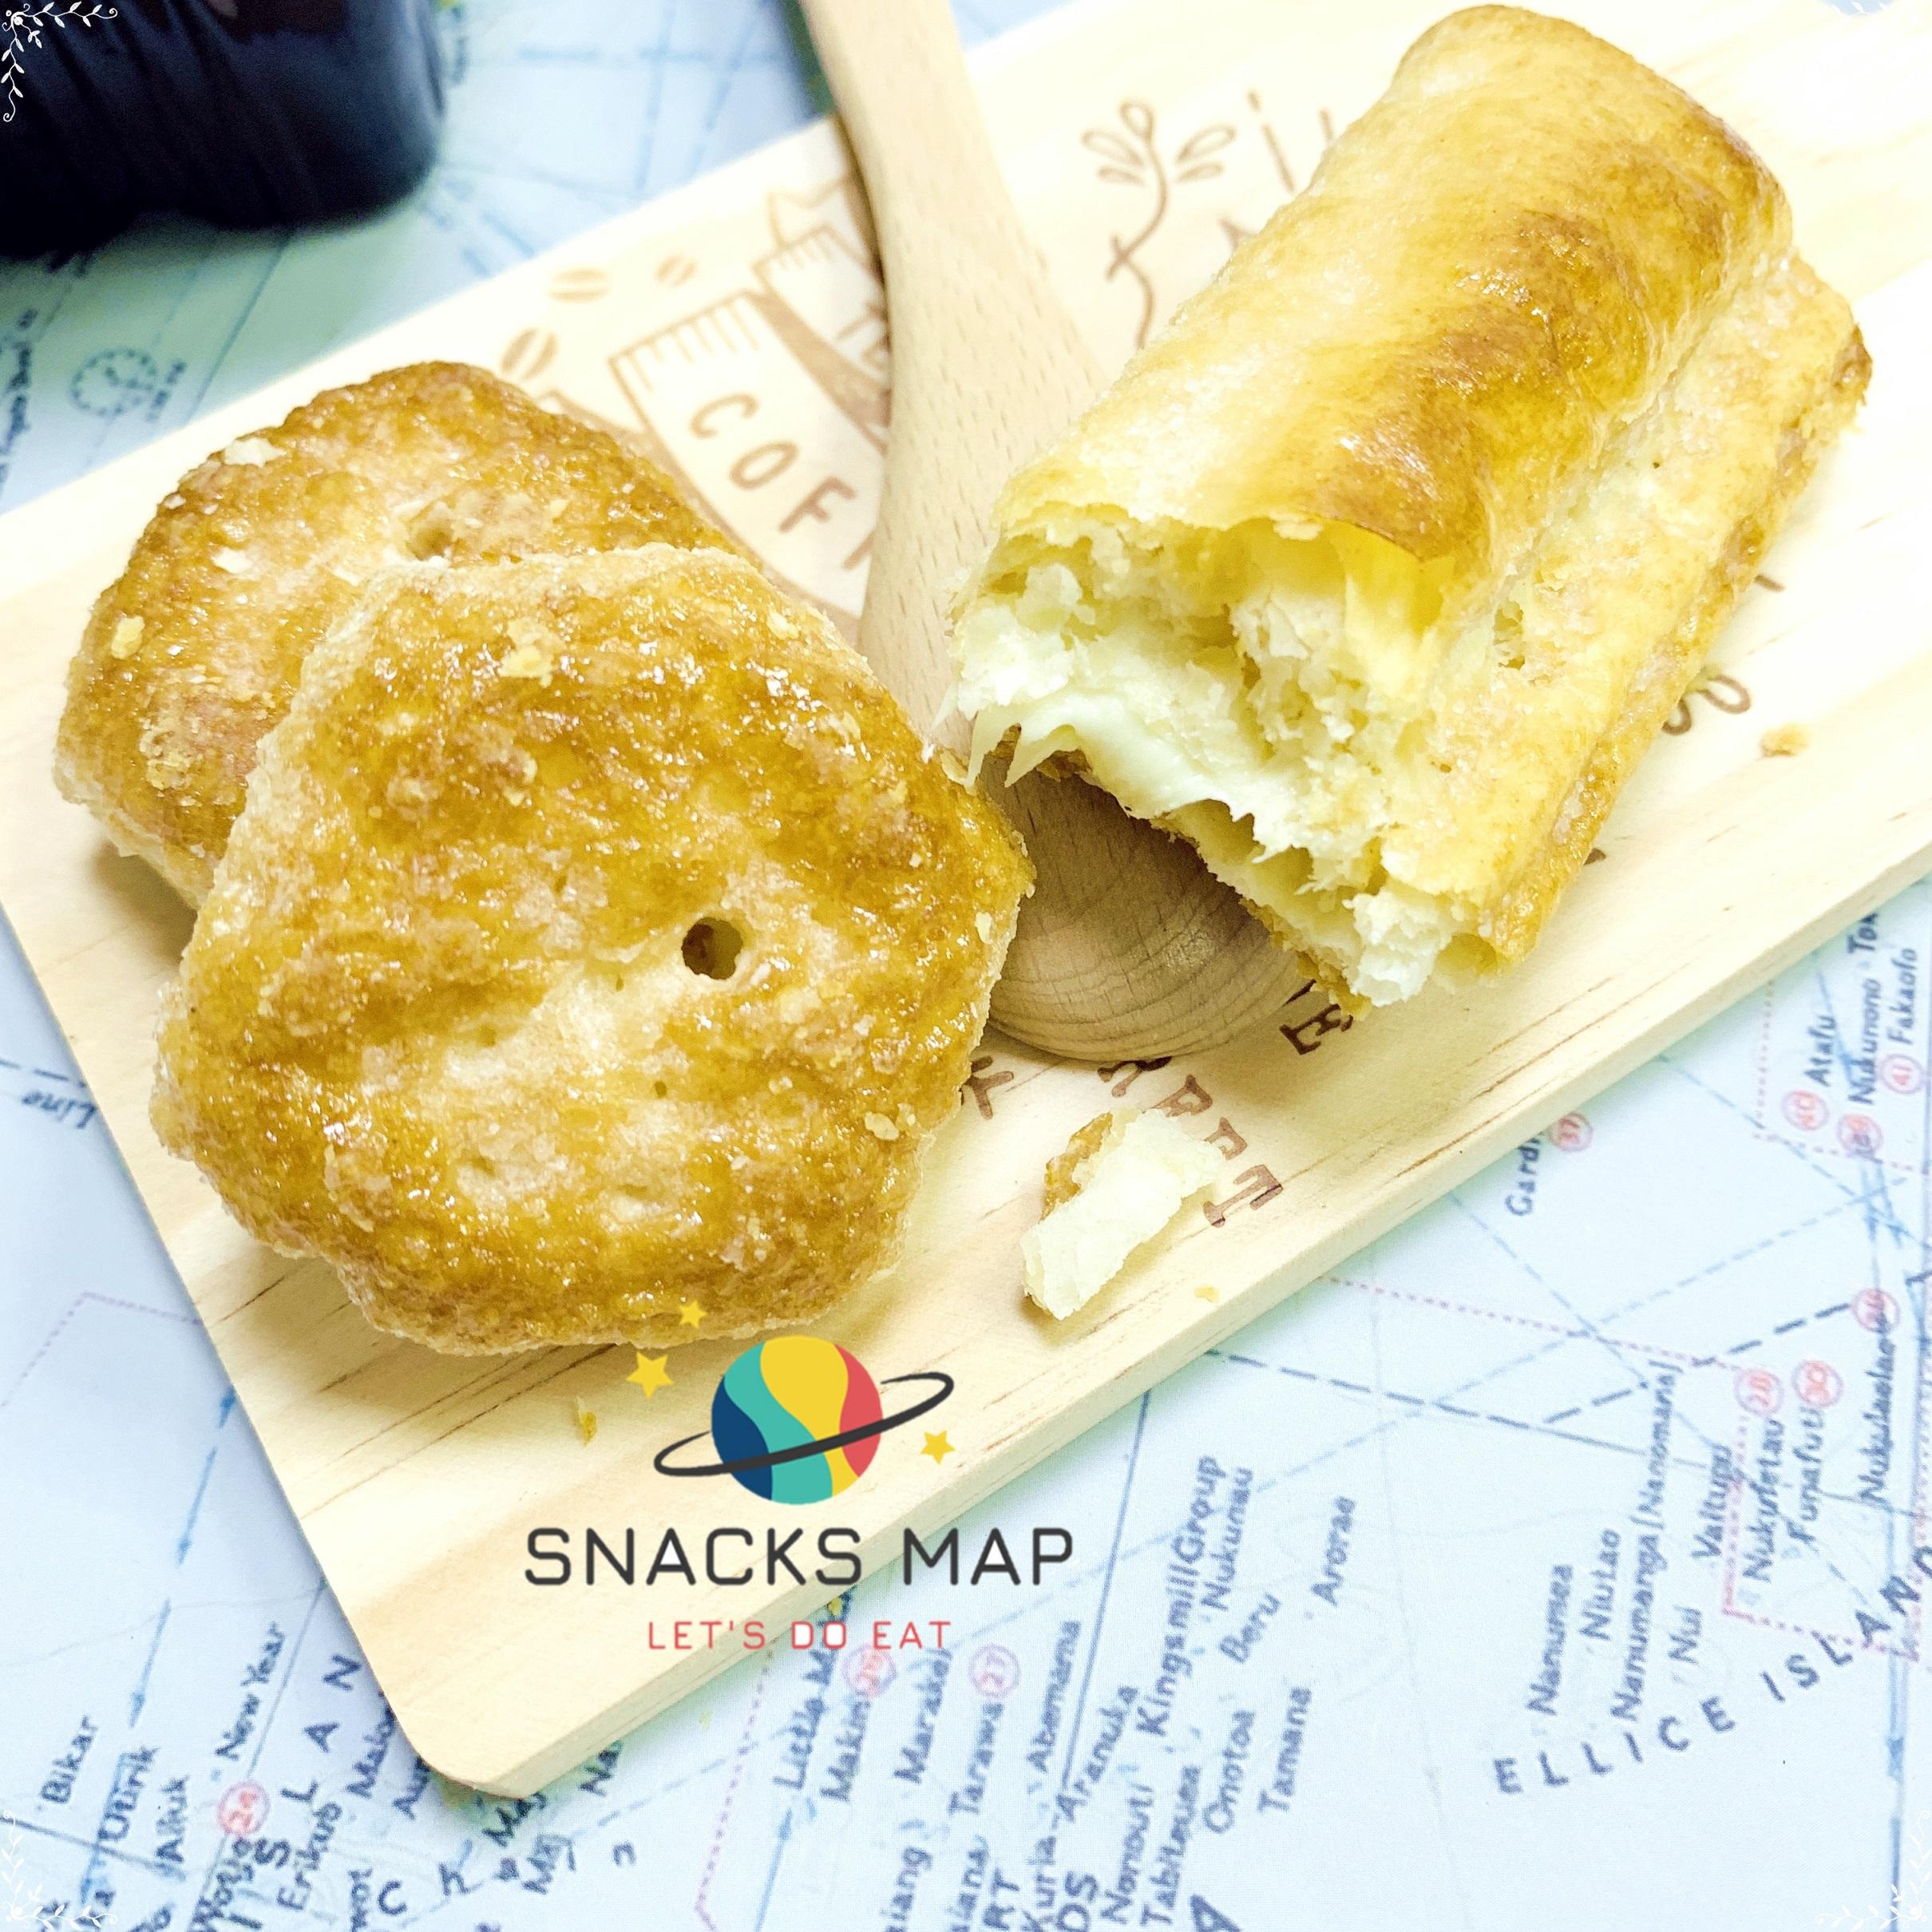 [SNACKS MAP零食地圖]義大利 維西尼 MINI千層酥 奶霜夾心酥餅 卡士達香草風味 榛果巧克力 奶素  全館399 超取免運